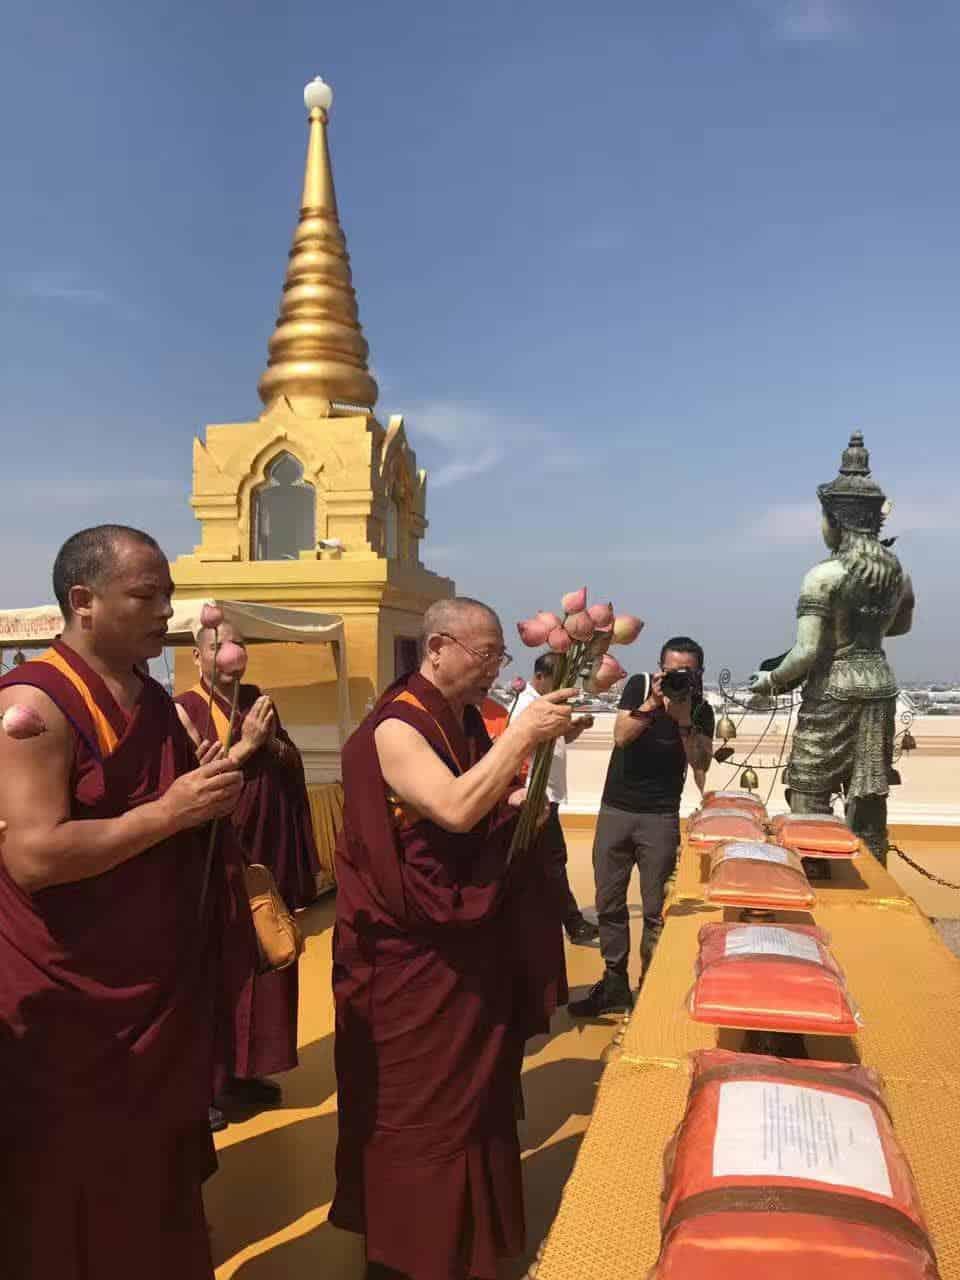 Gosok Rinpoche Thailand 2017 T024 5206db24d258f07d37e1f81e6a5a28c